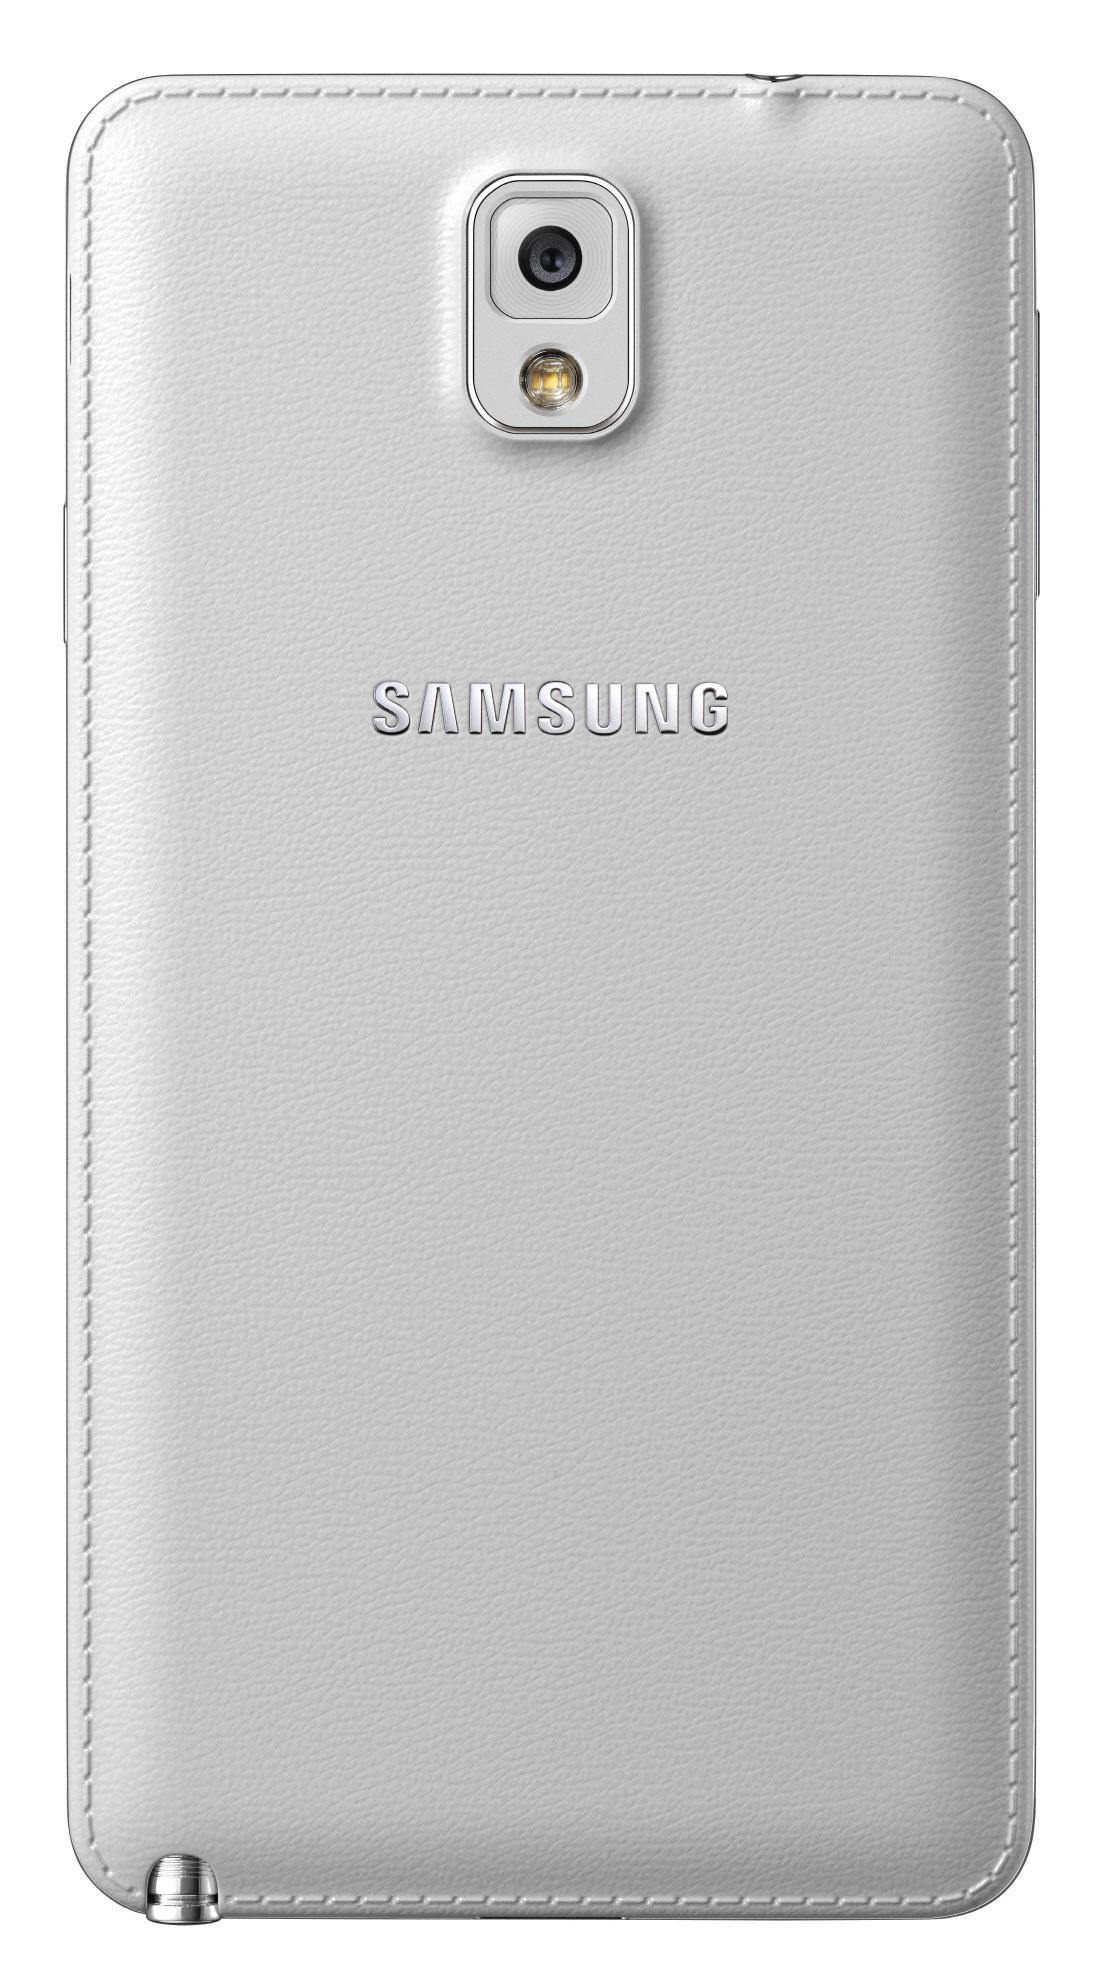 Samsung Galaxy Note 3 vista trasera